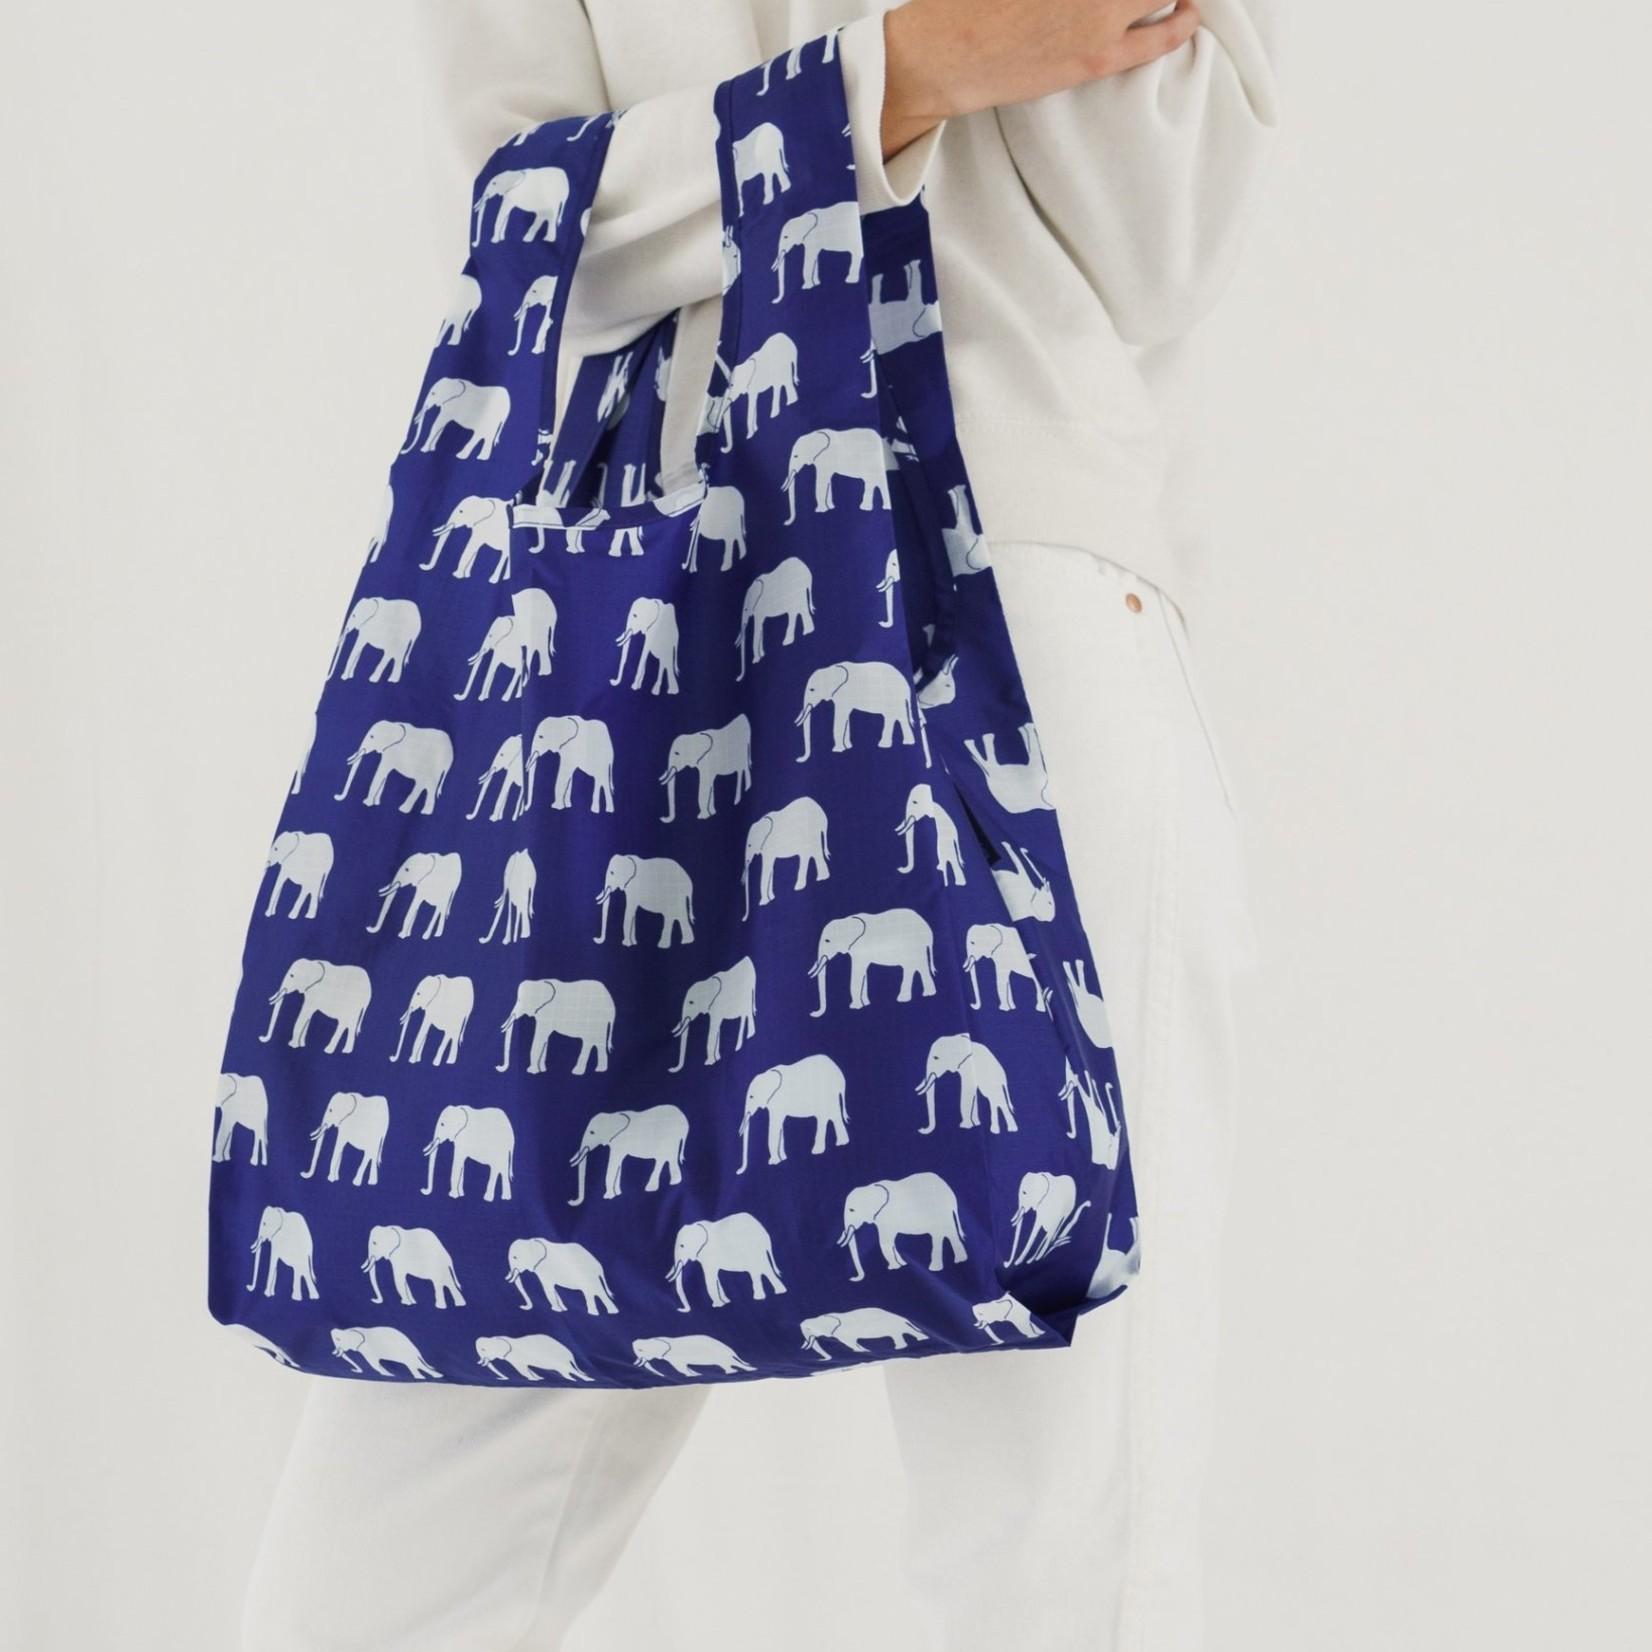 Baggu Baggu Reusable Bag Standard Blue Elephant